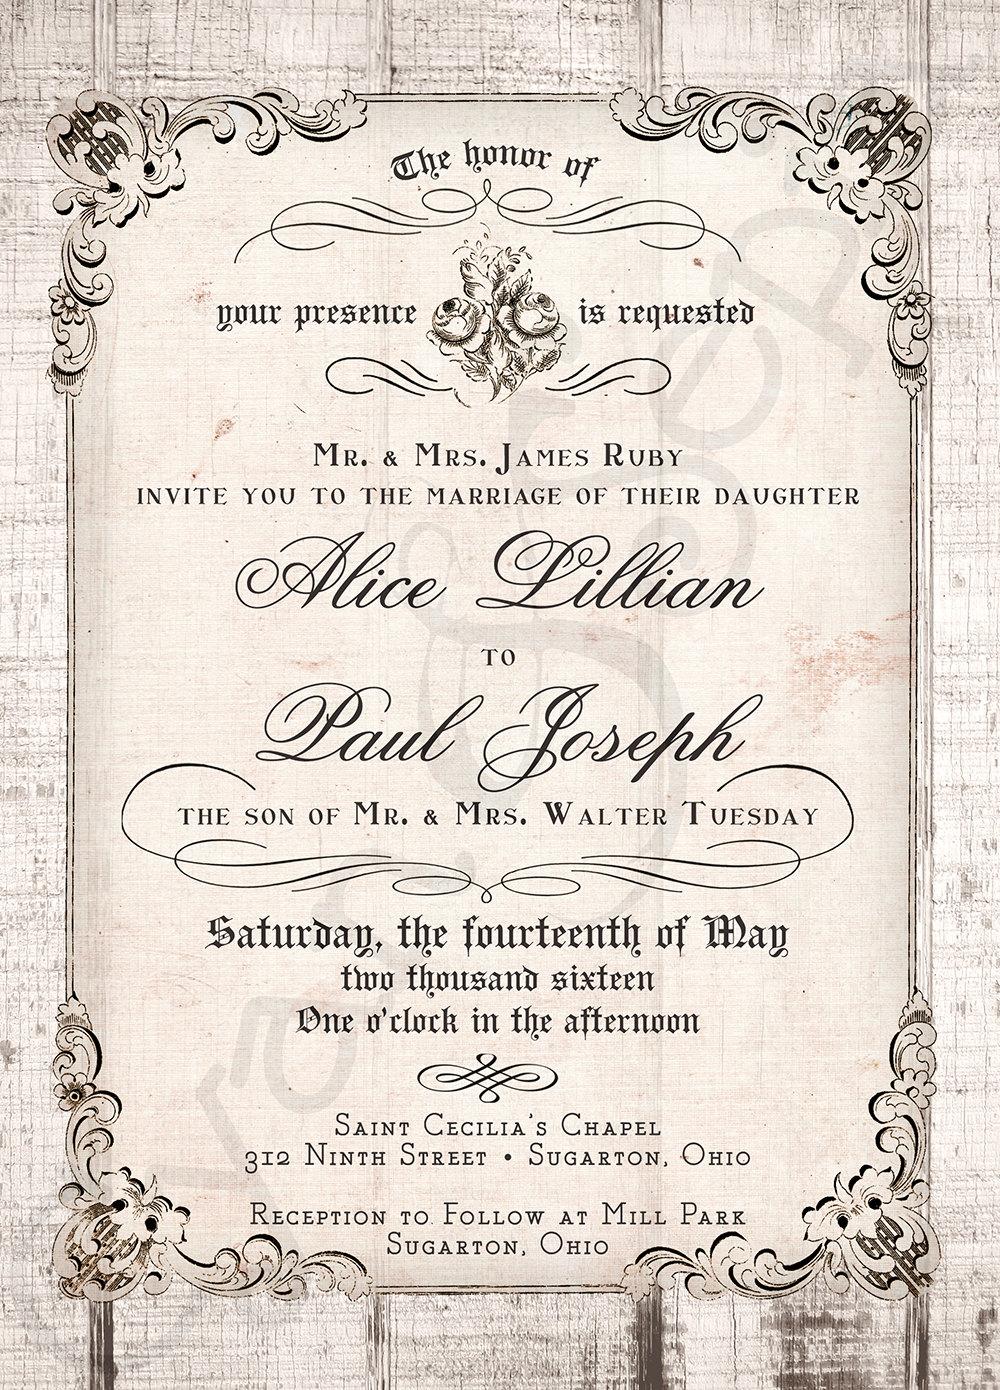 Vista Print Graduation Invitations with good invitations example